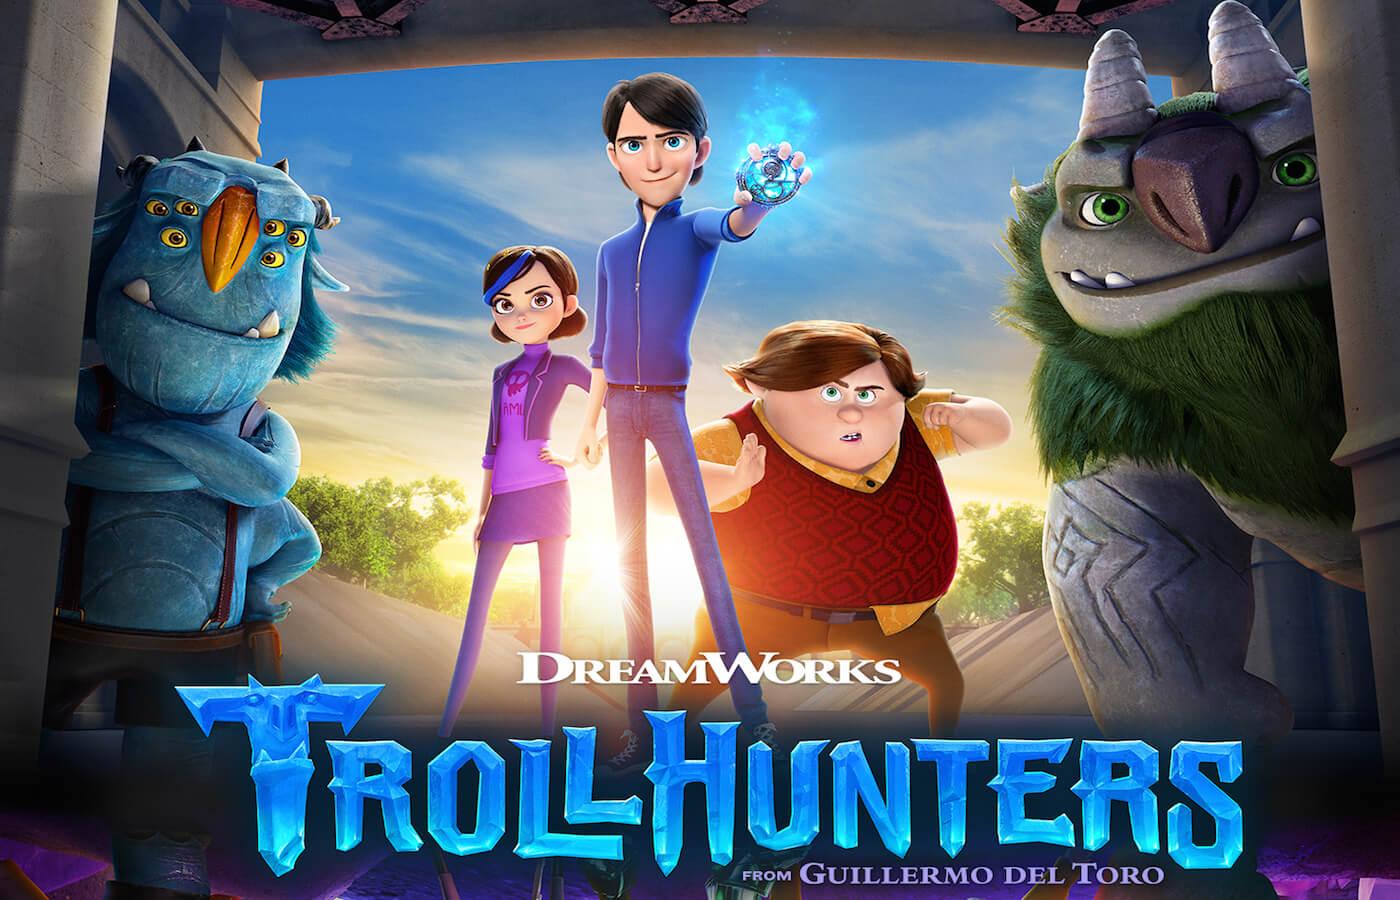 trollhunters-poster-2.jpg